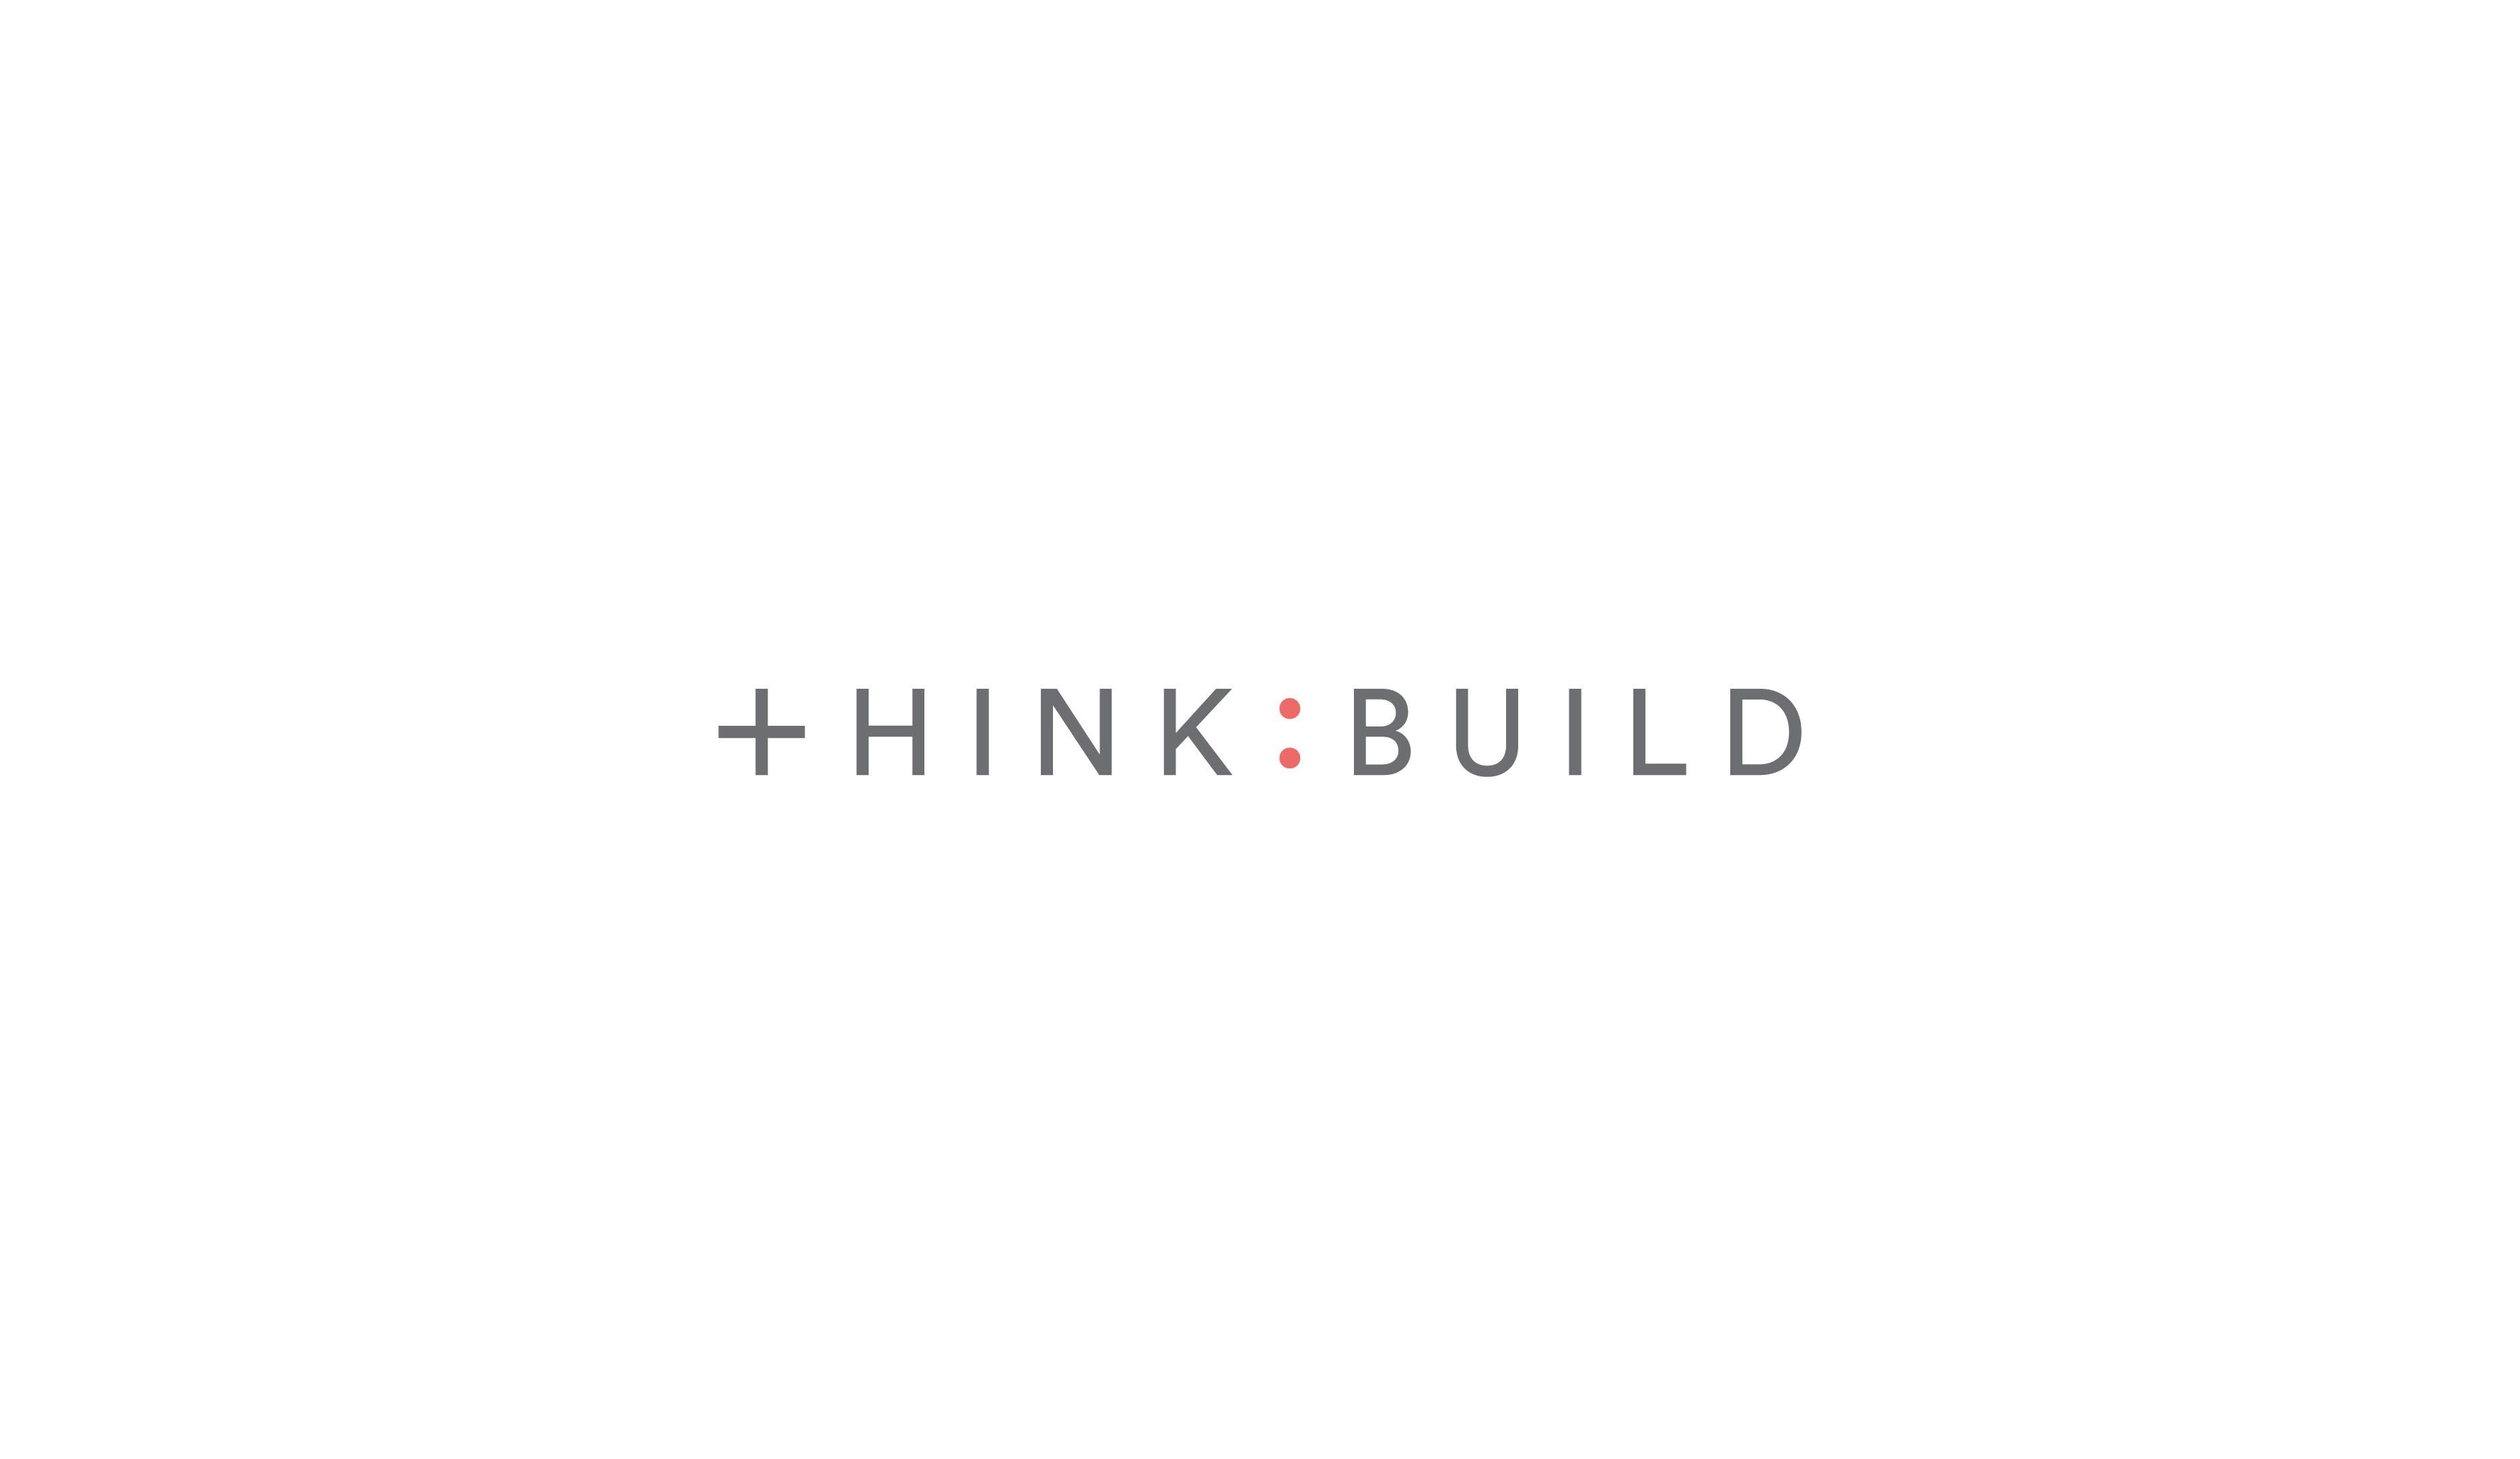 Think:Build brand identity